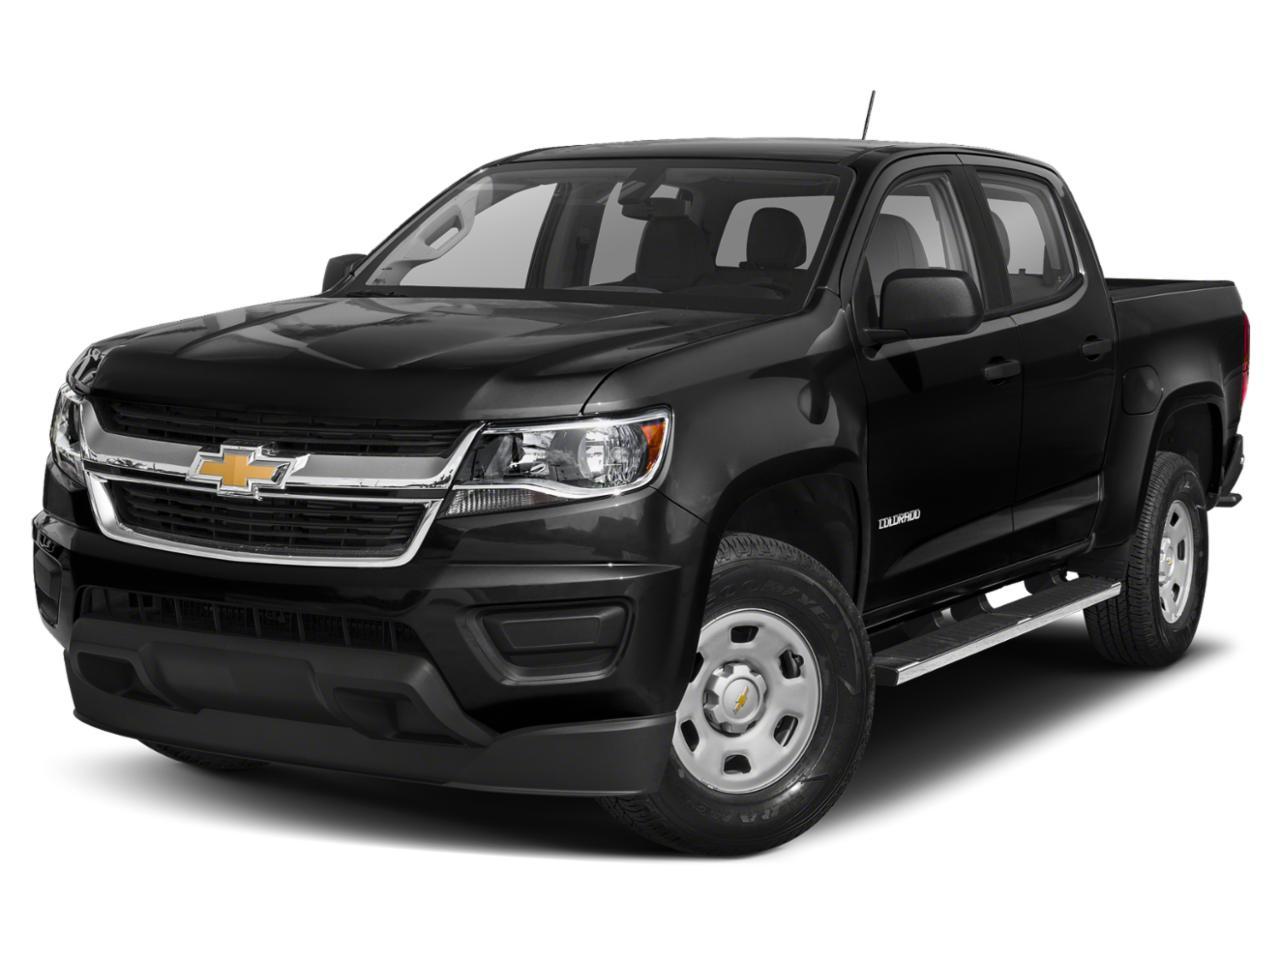 2019 Chevrolet Colorado Vehicle Photo in Plainfield, IL 60586